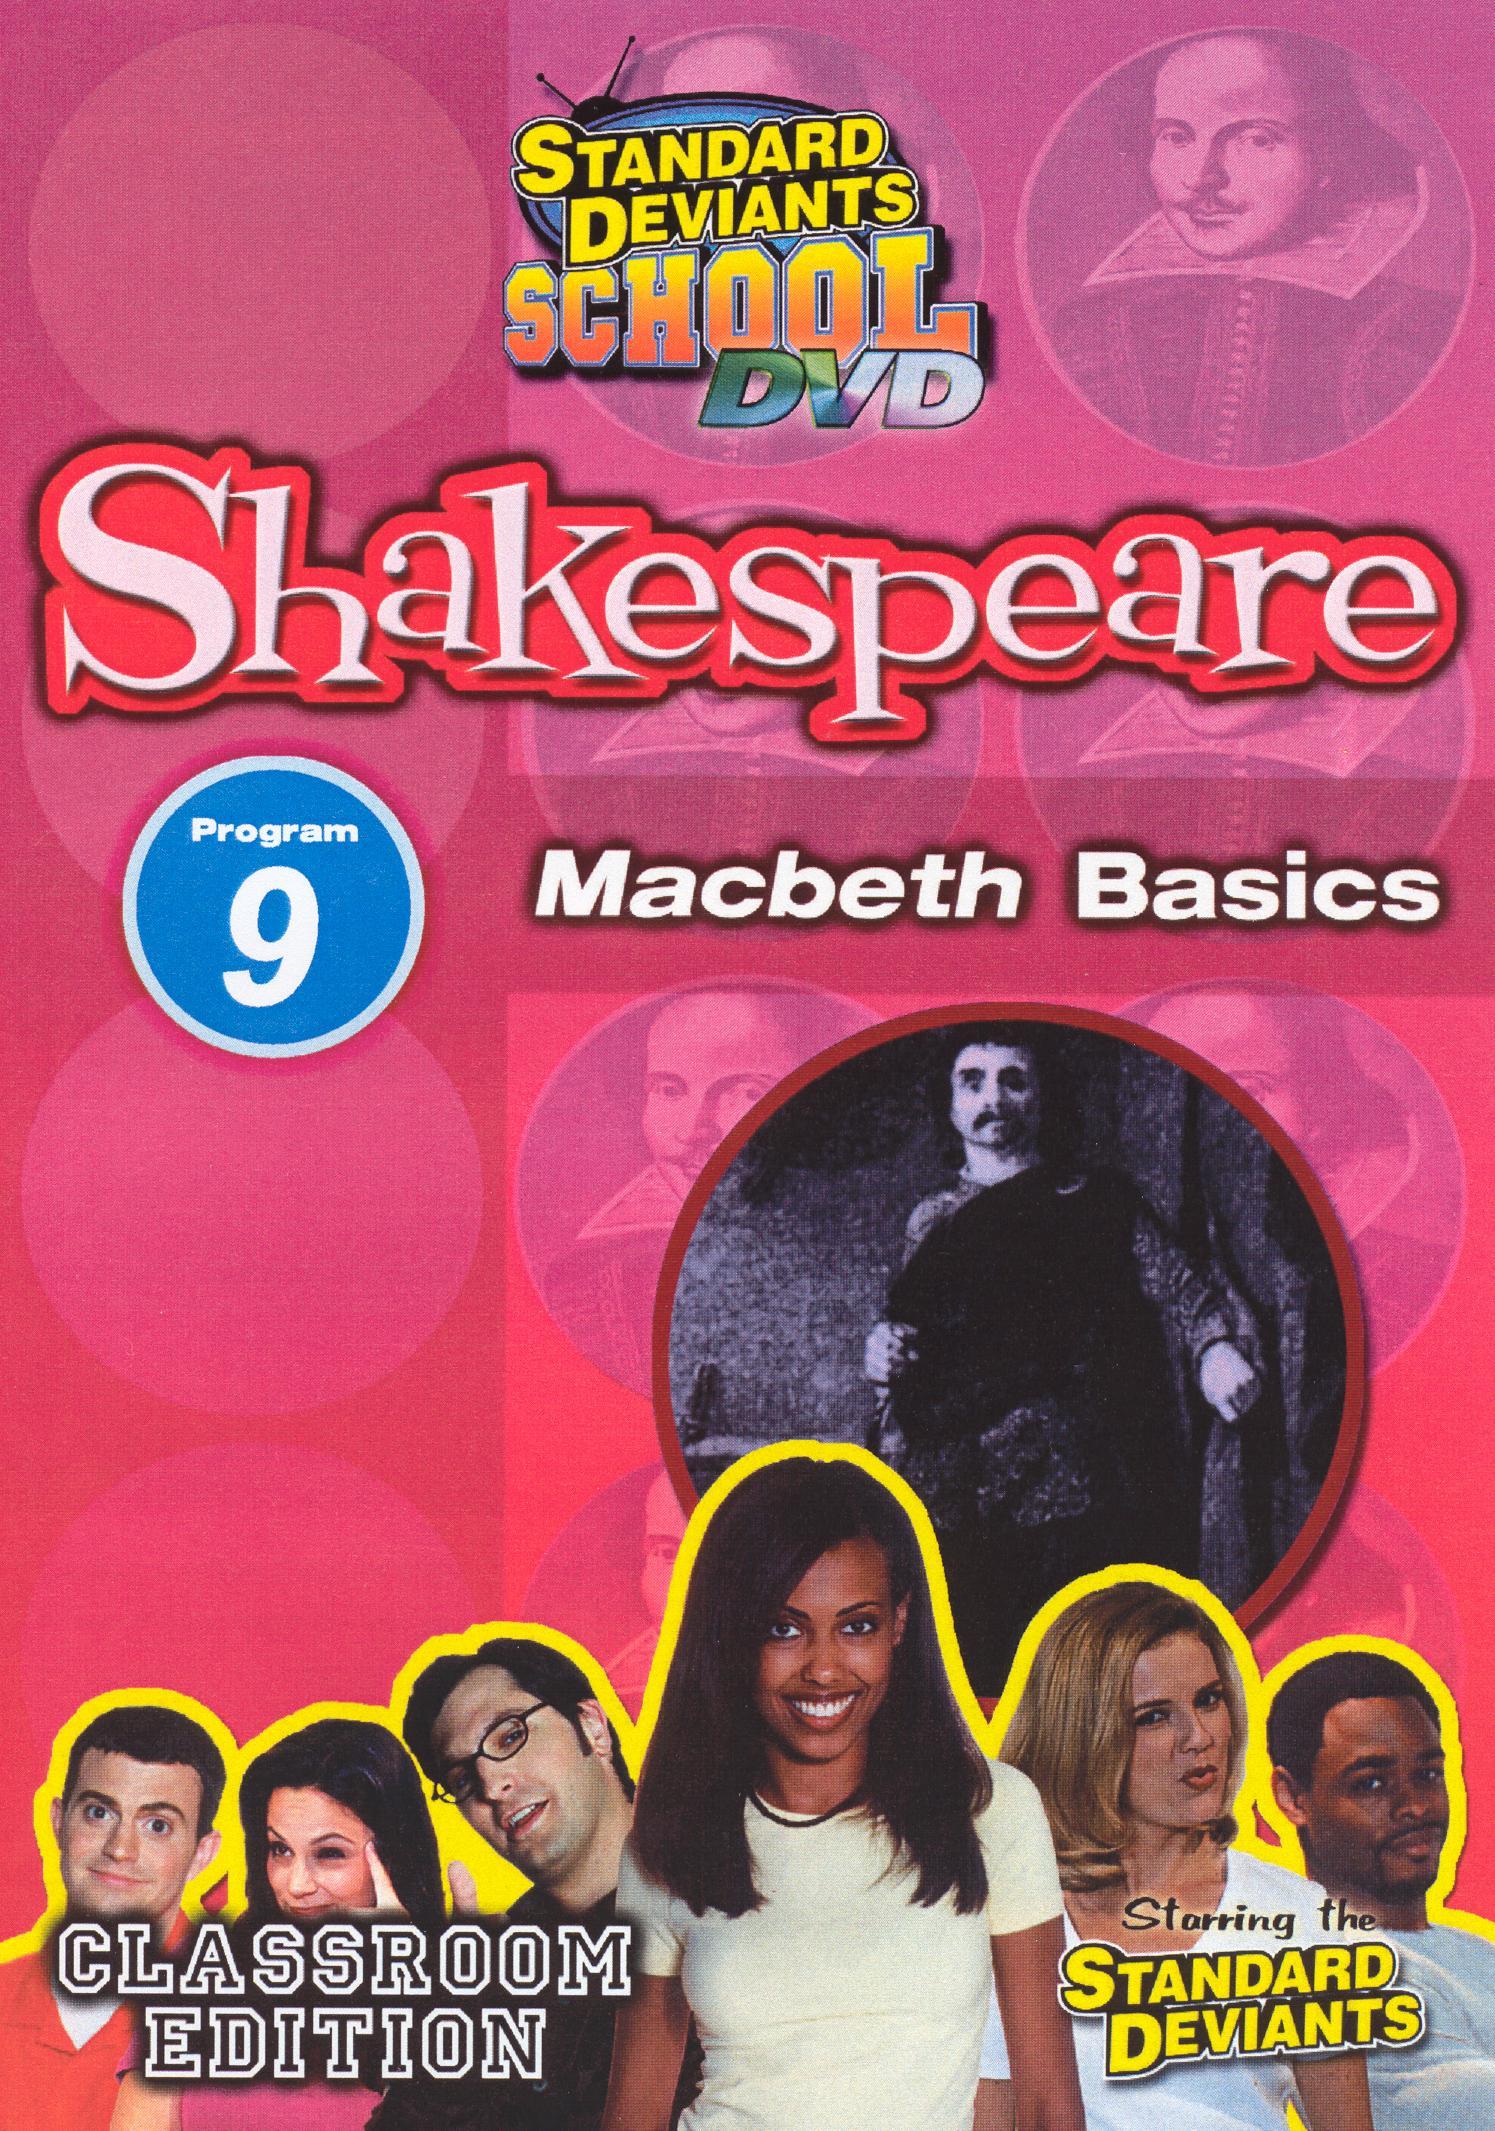 Standard Deviants School: Shakespeare, Program 9 - Macbeth Basics